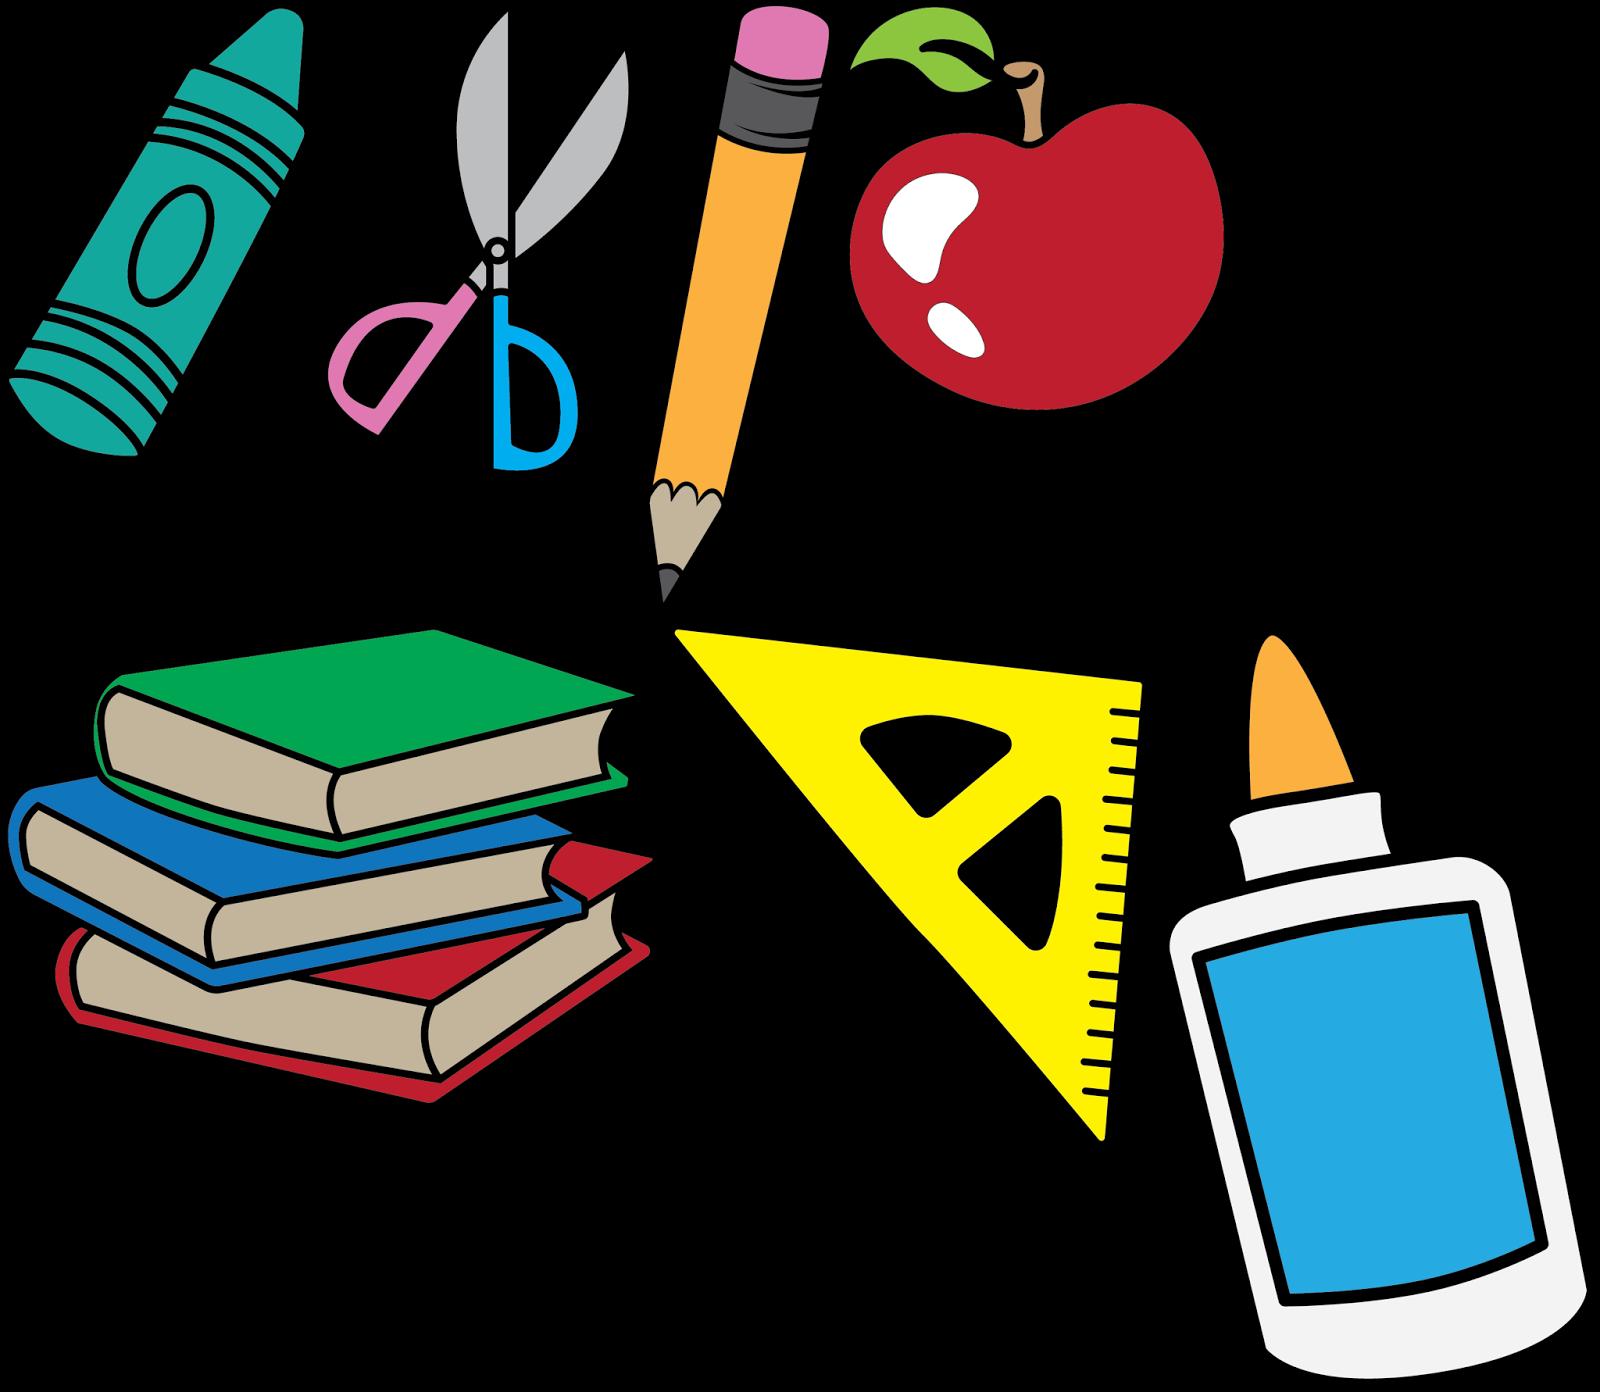 Crayon clipart scissors PENCIL SILHOUETTE SCHOOL BOOKS PENCIL